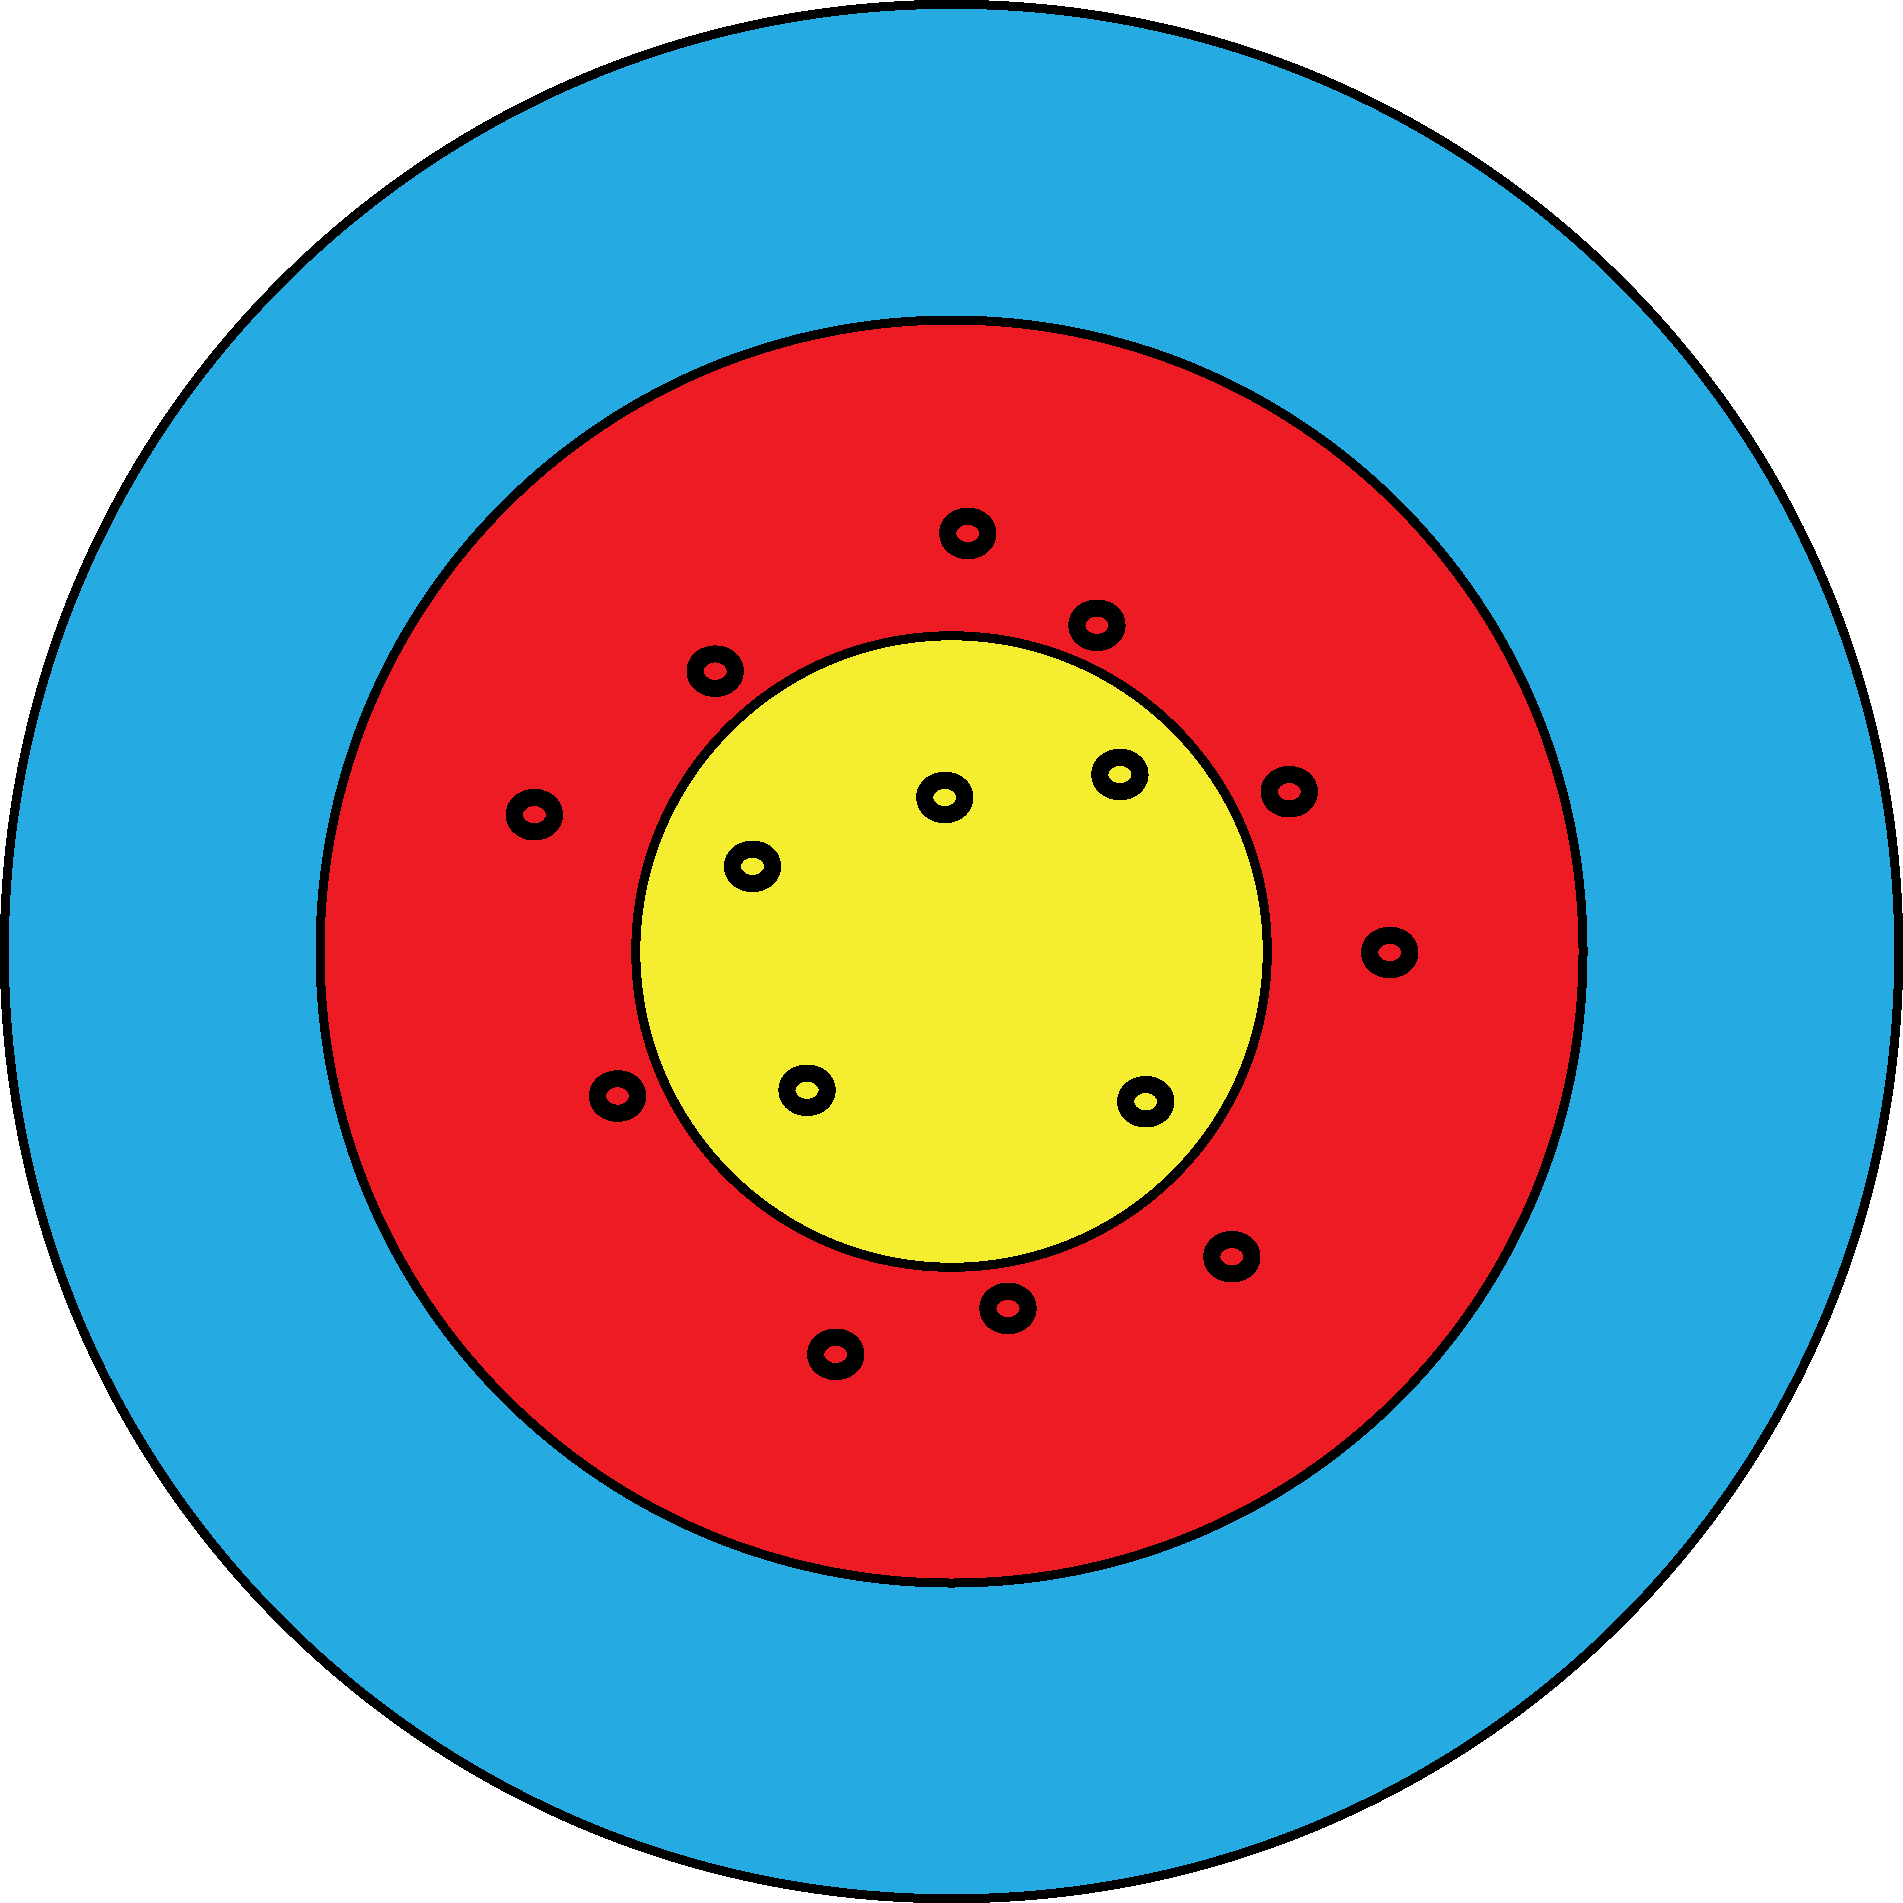 08_statistical_testing_for_high_throughput/img/TargetVariance.png